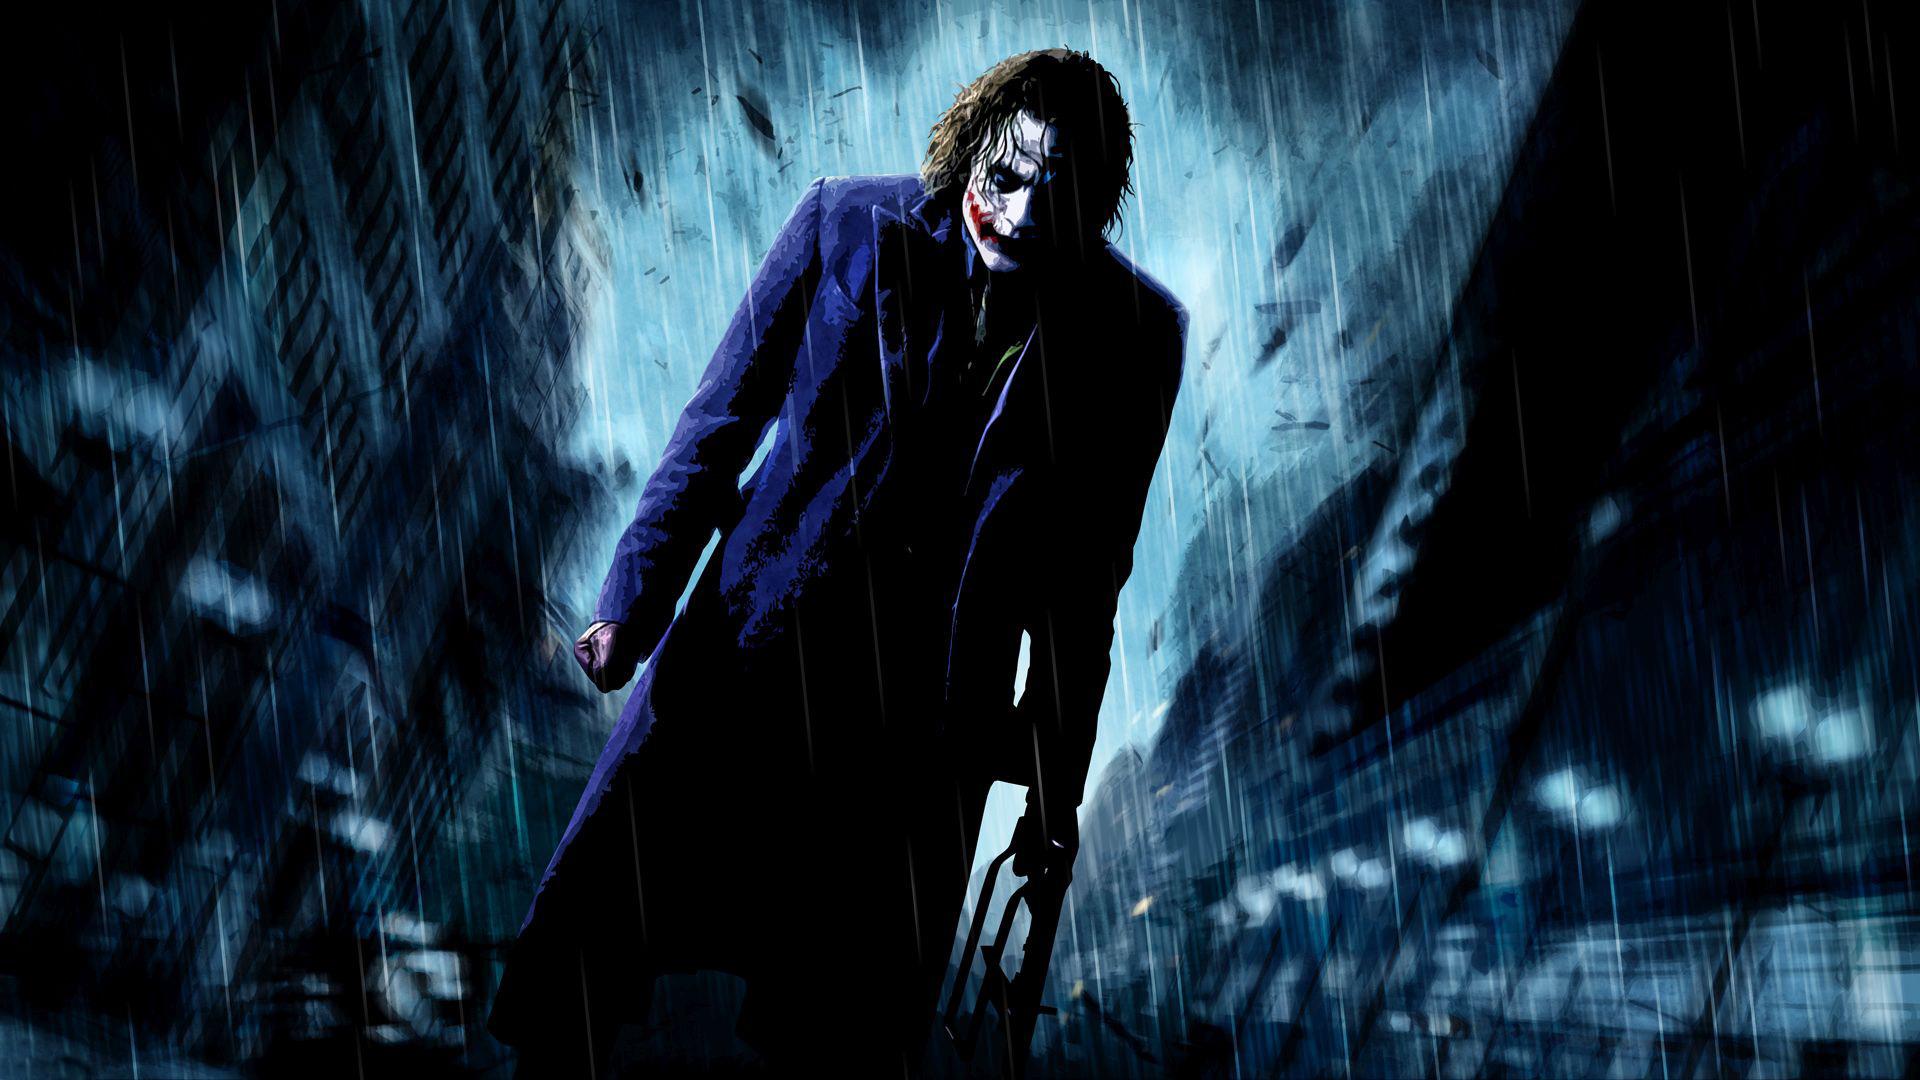 Joker Heath Ledger Why So Serious   wallpaper 1920x1080